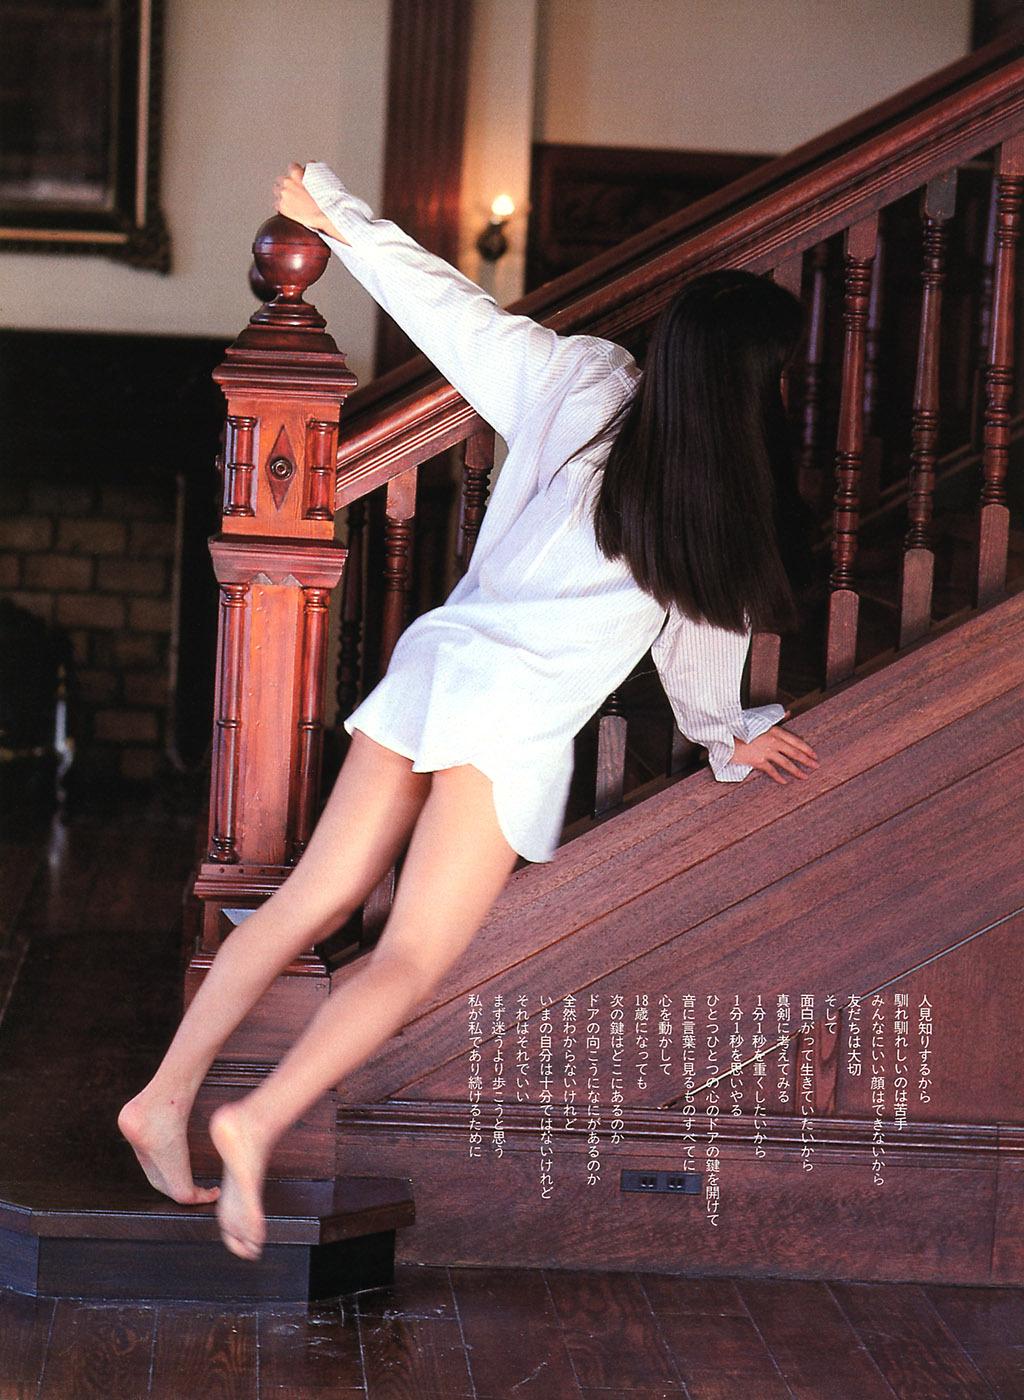 Shinobu Nakayama nude (81 photo), Sexy, Sideboobs, Selfie, legs 2015